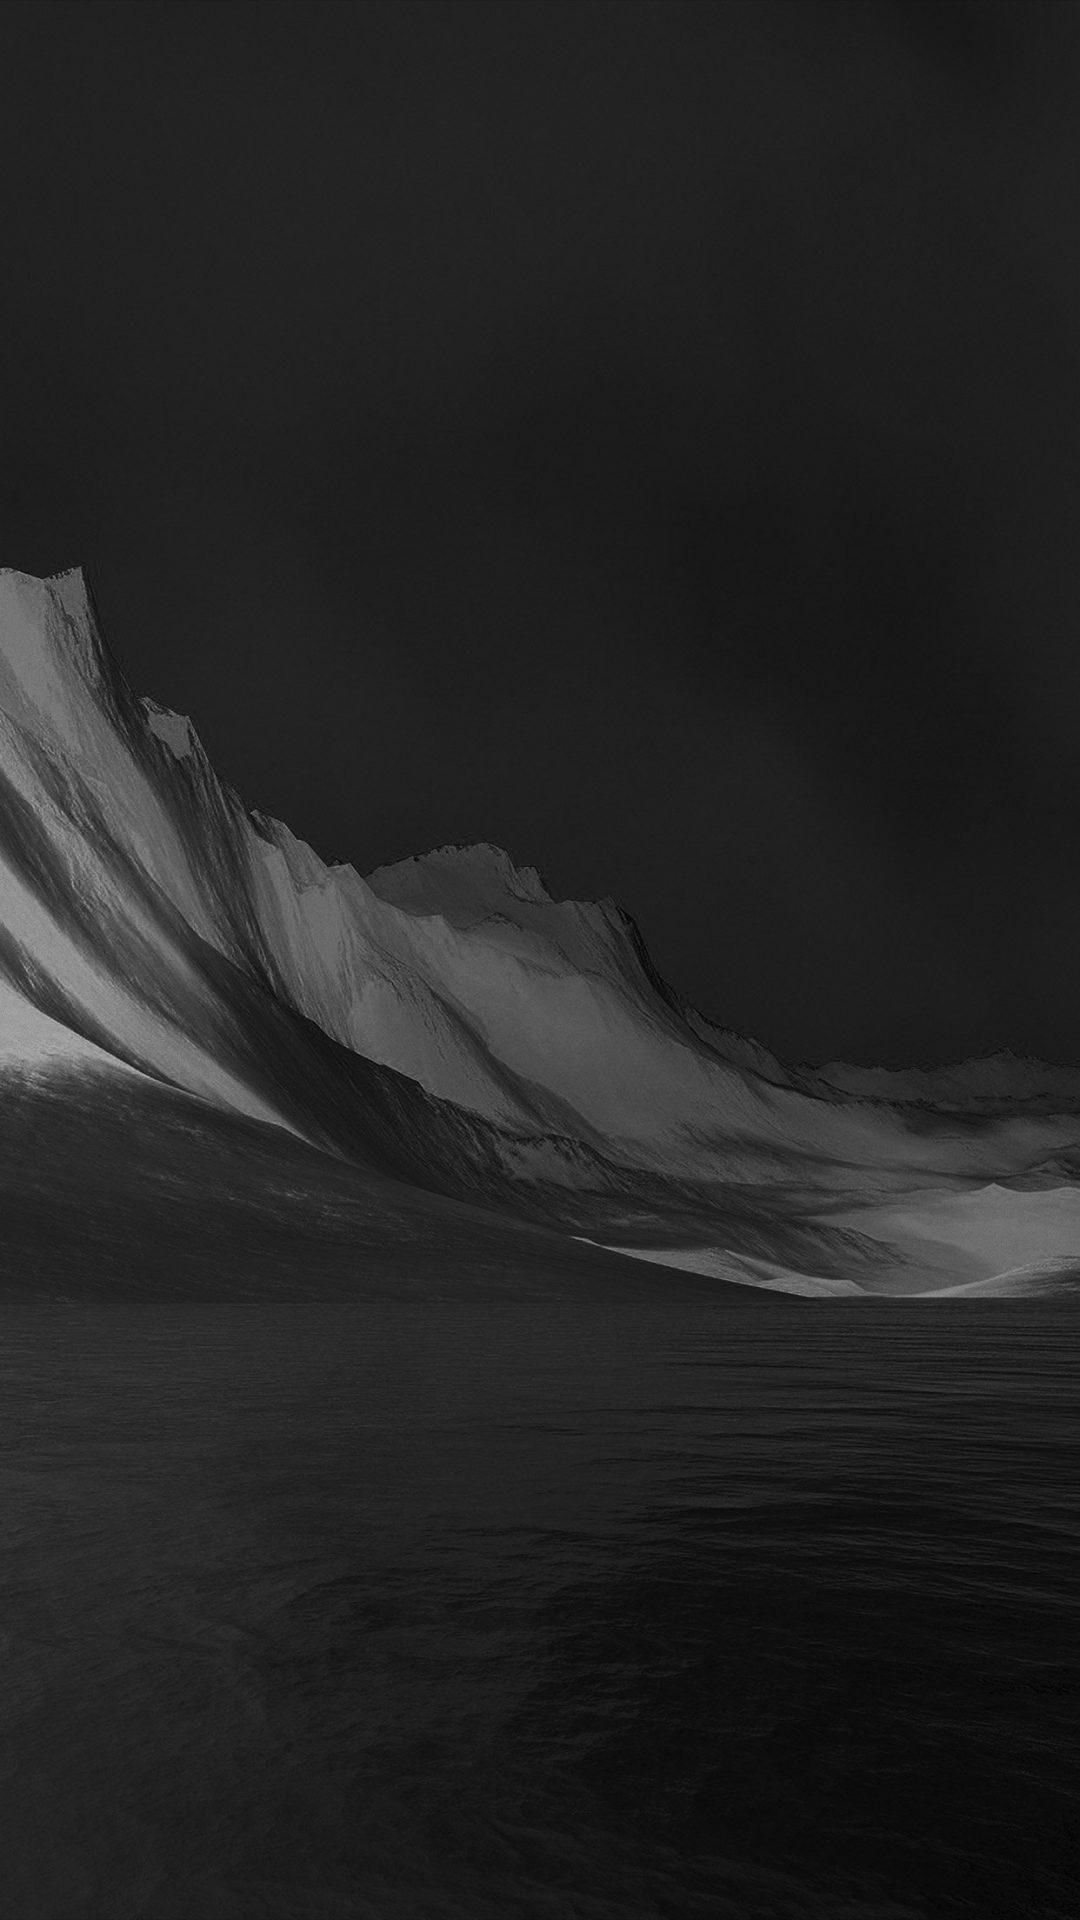 Lg G Flex Art Mountain Digital Bw Dark Black Abstract